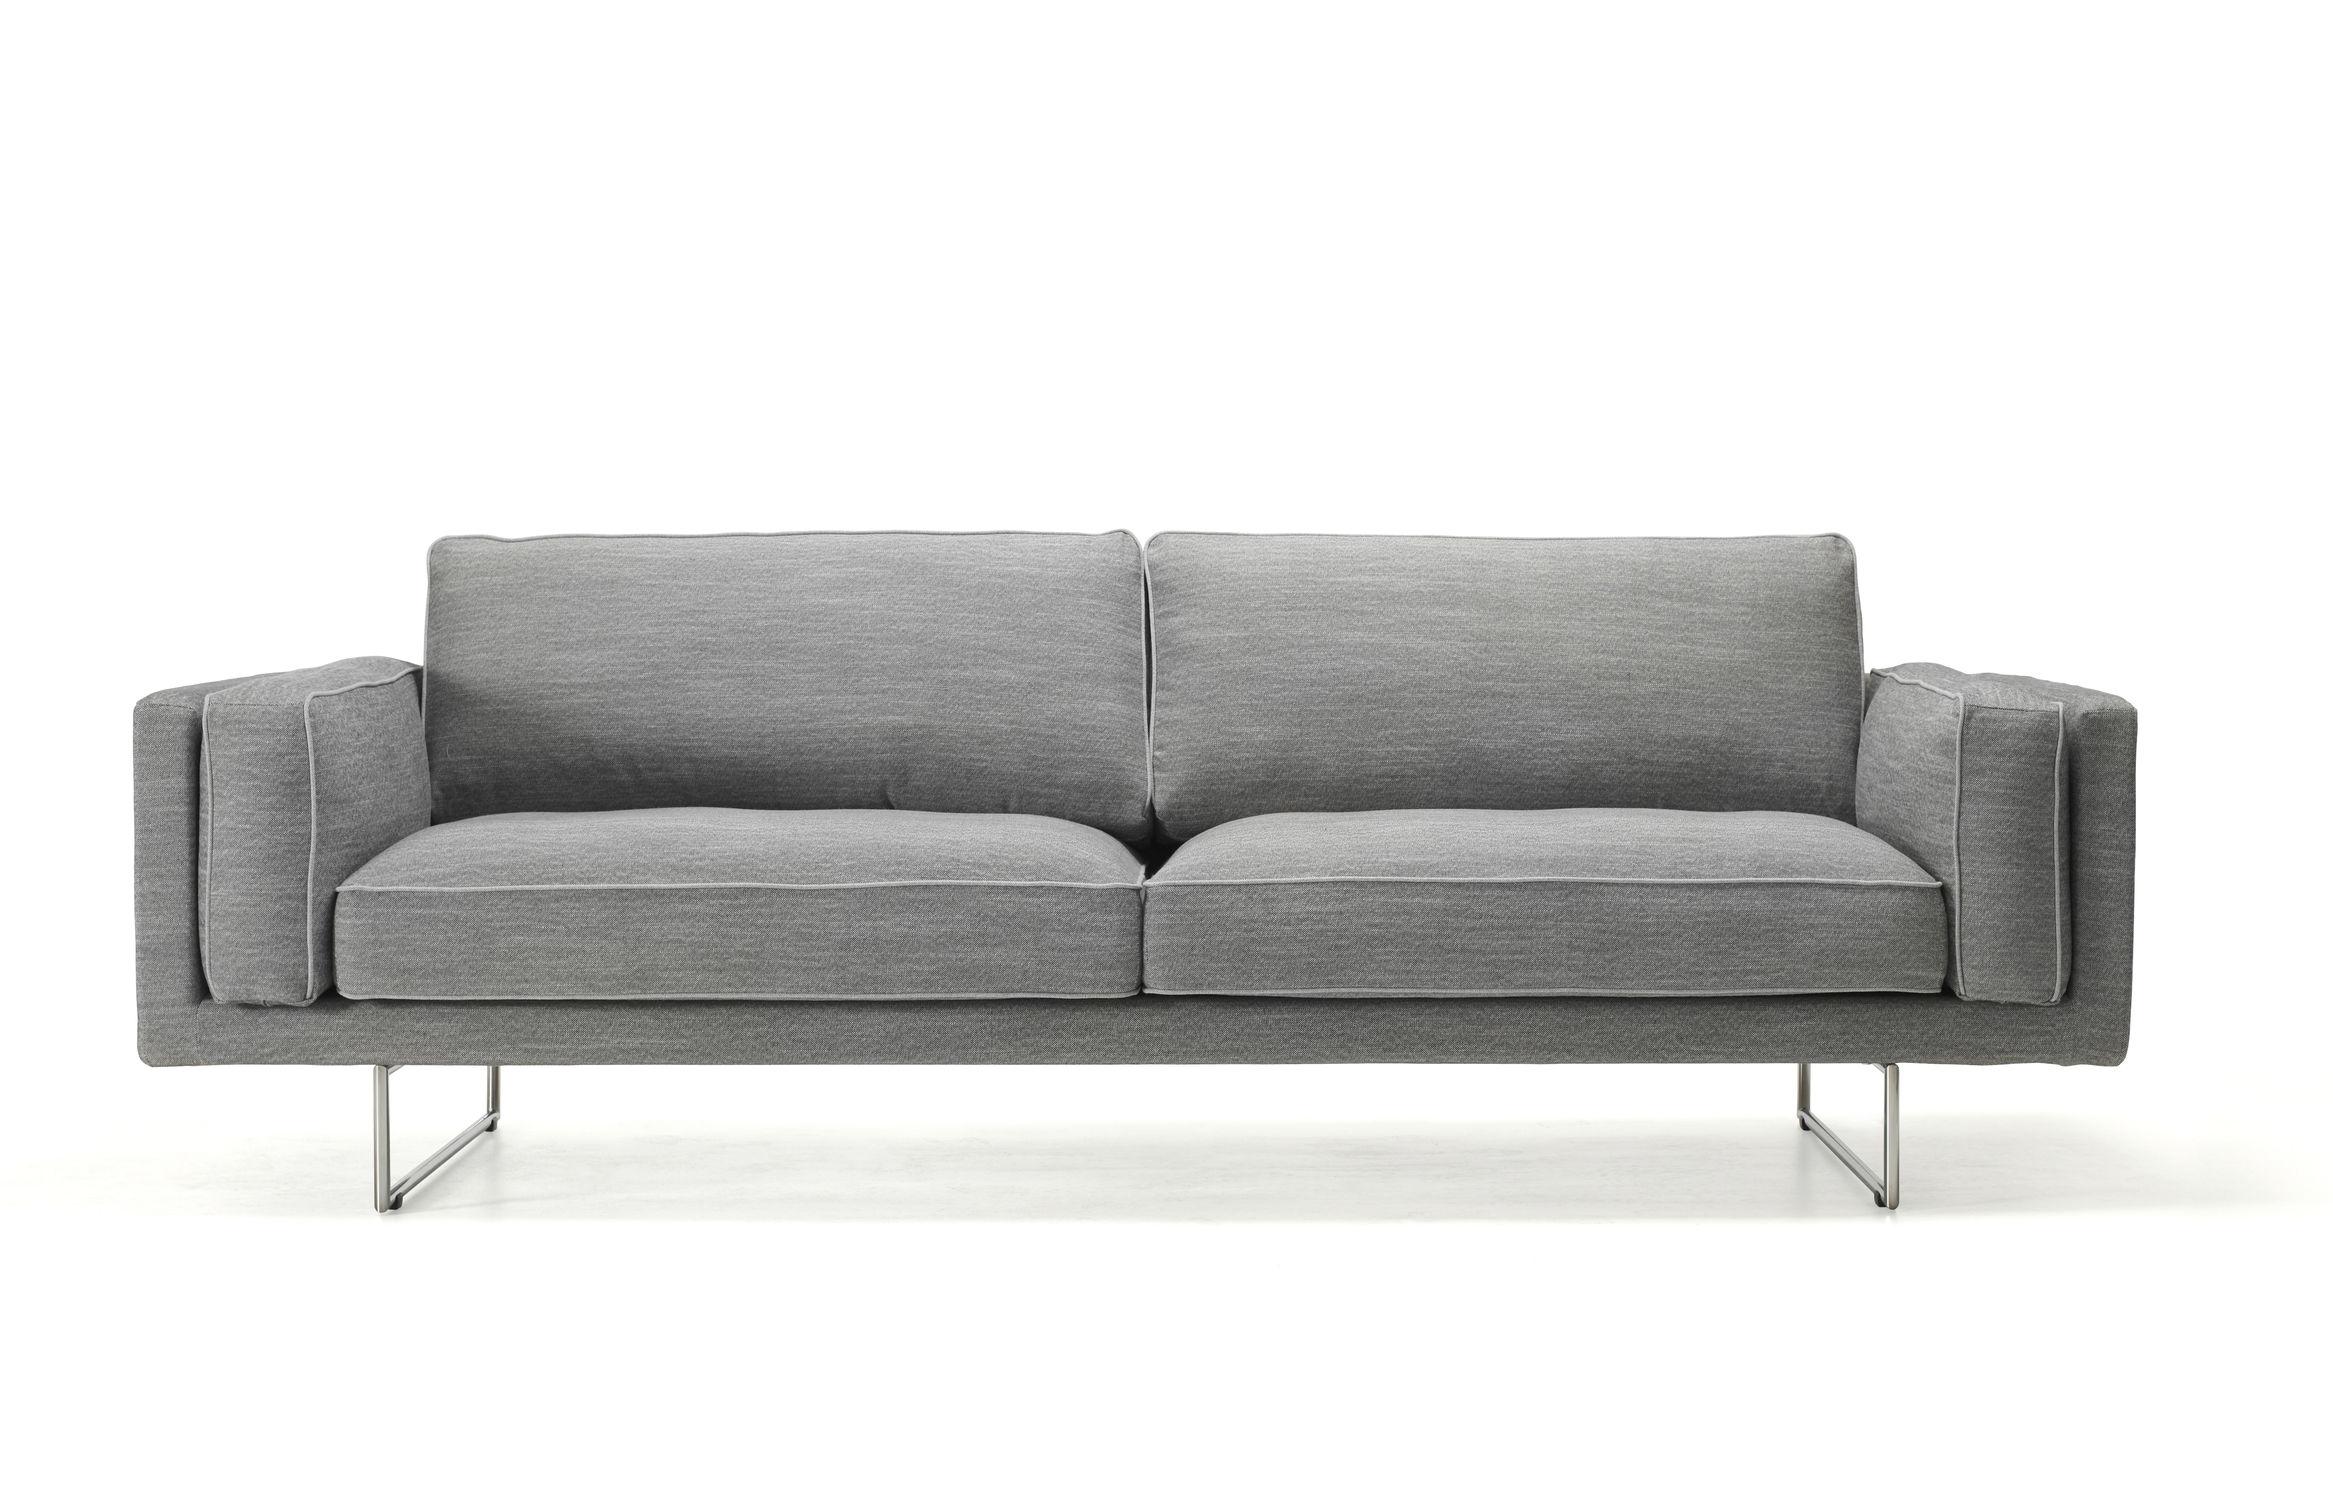 Elegant Sofa Möbel Beste Wahl Contemporary / Fabric / 3-seater / Anthracite